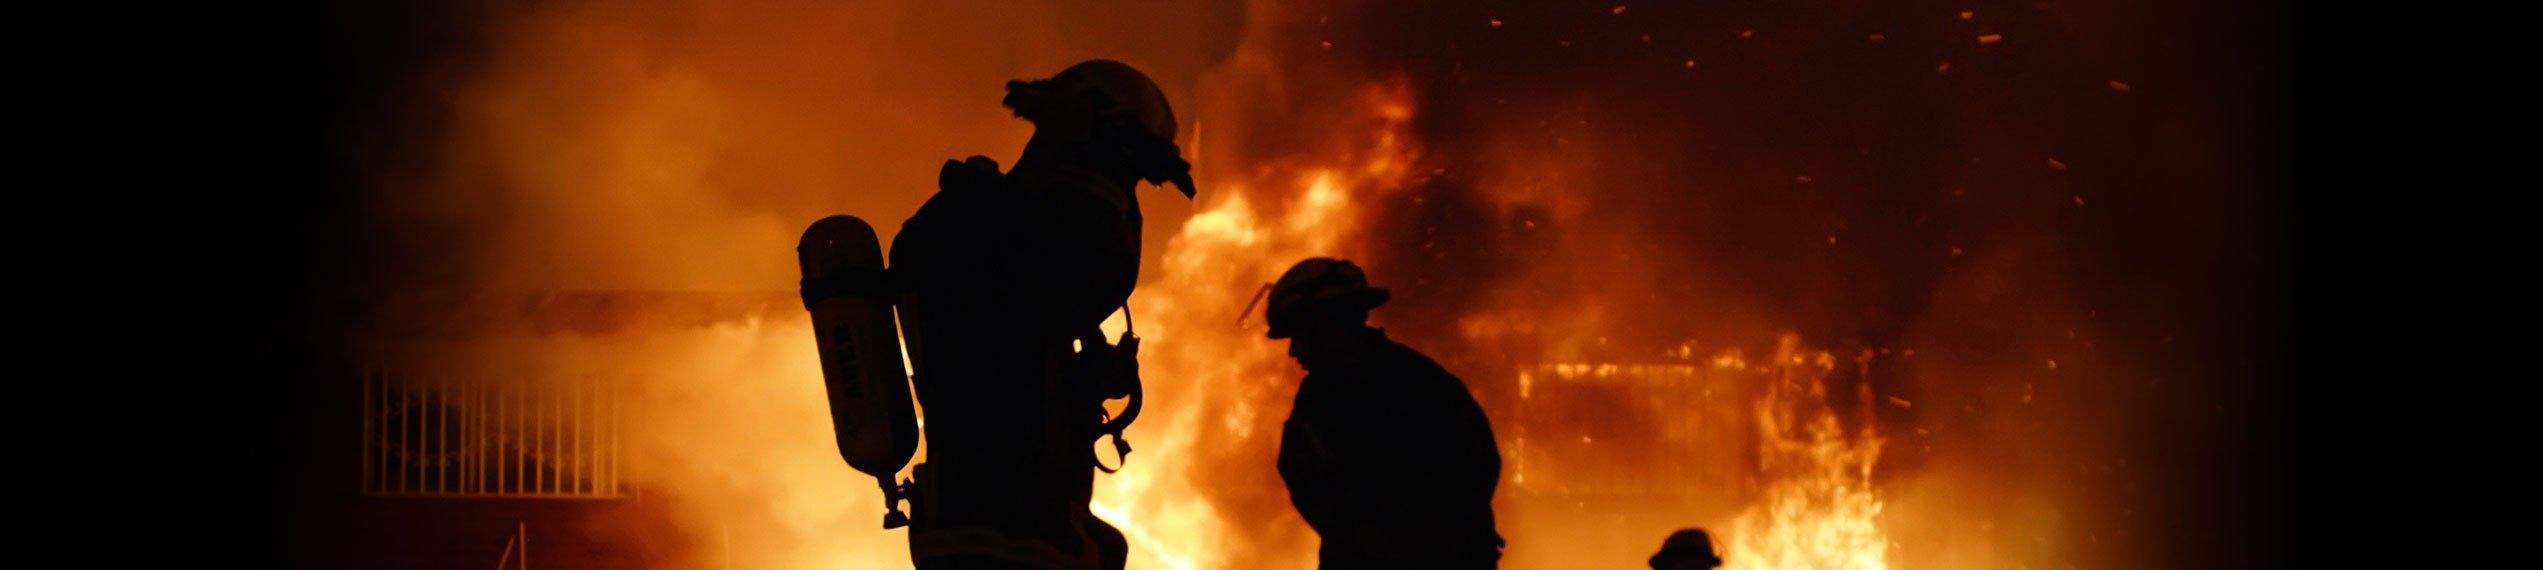 Fire & Smoke Damage Removal in Paul Davis Restoration of Bucks County PA